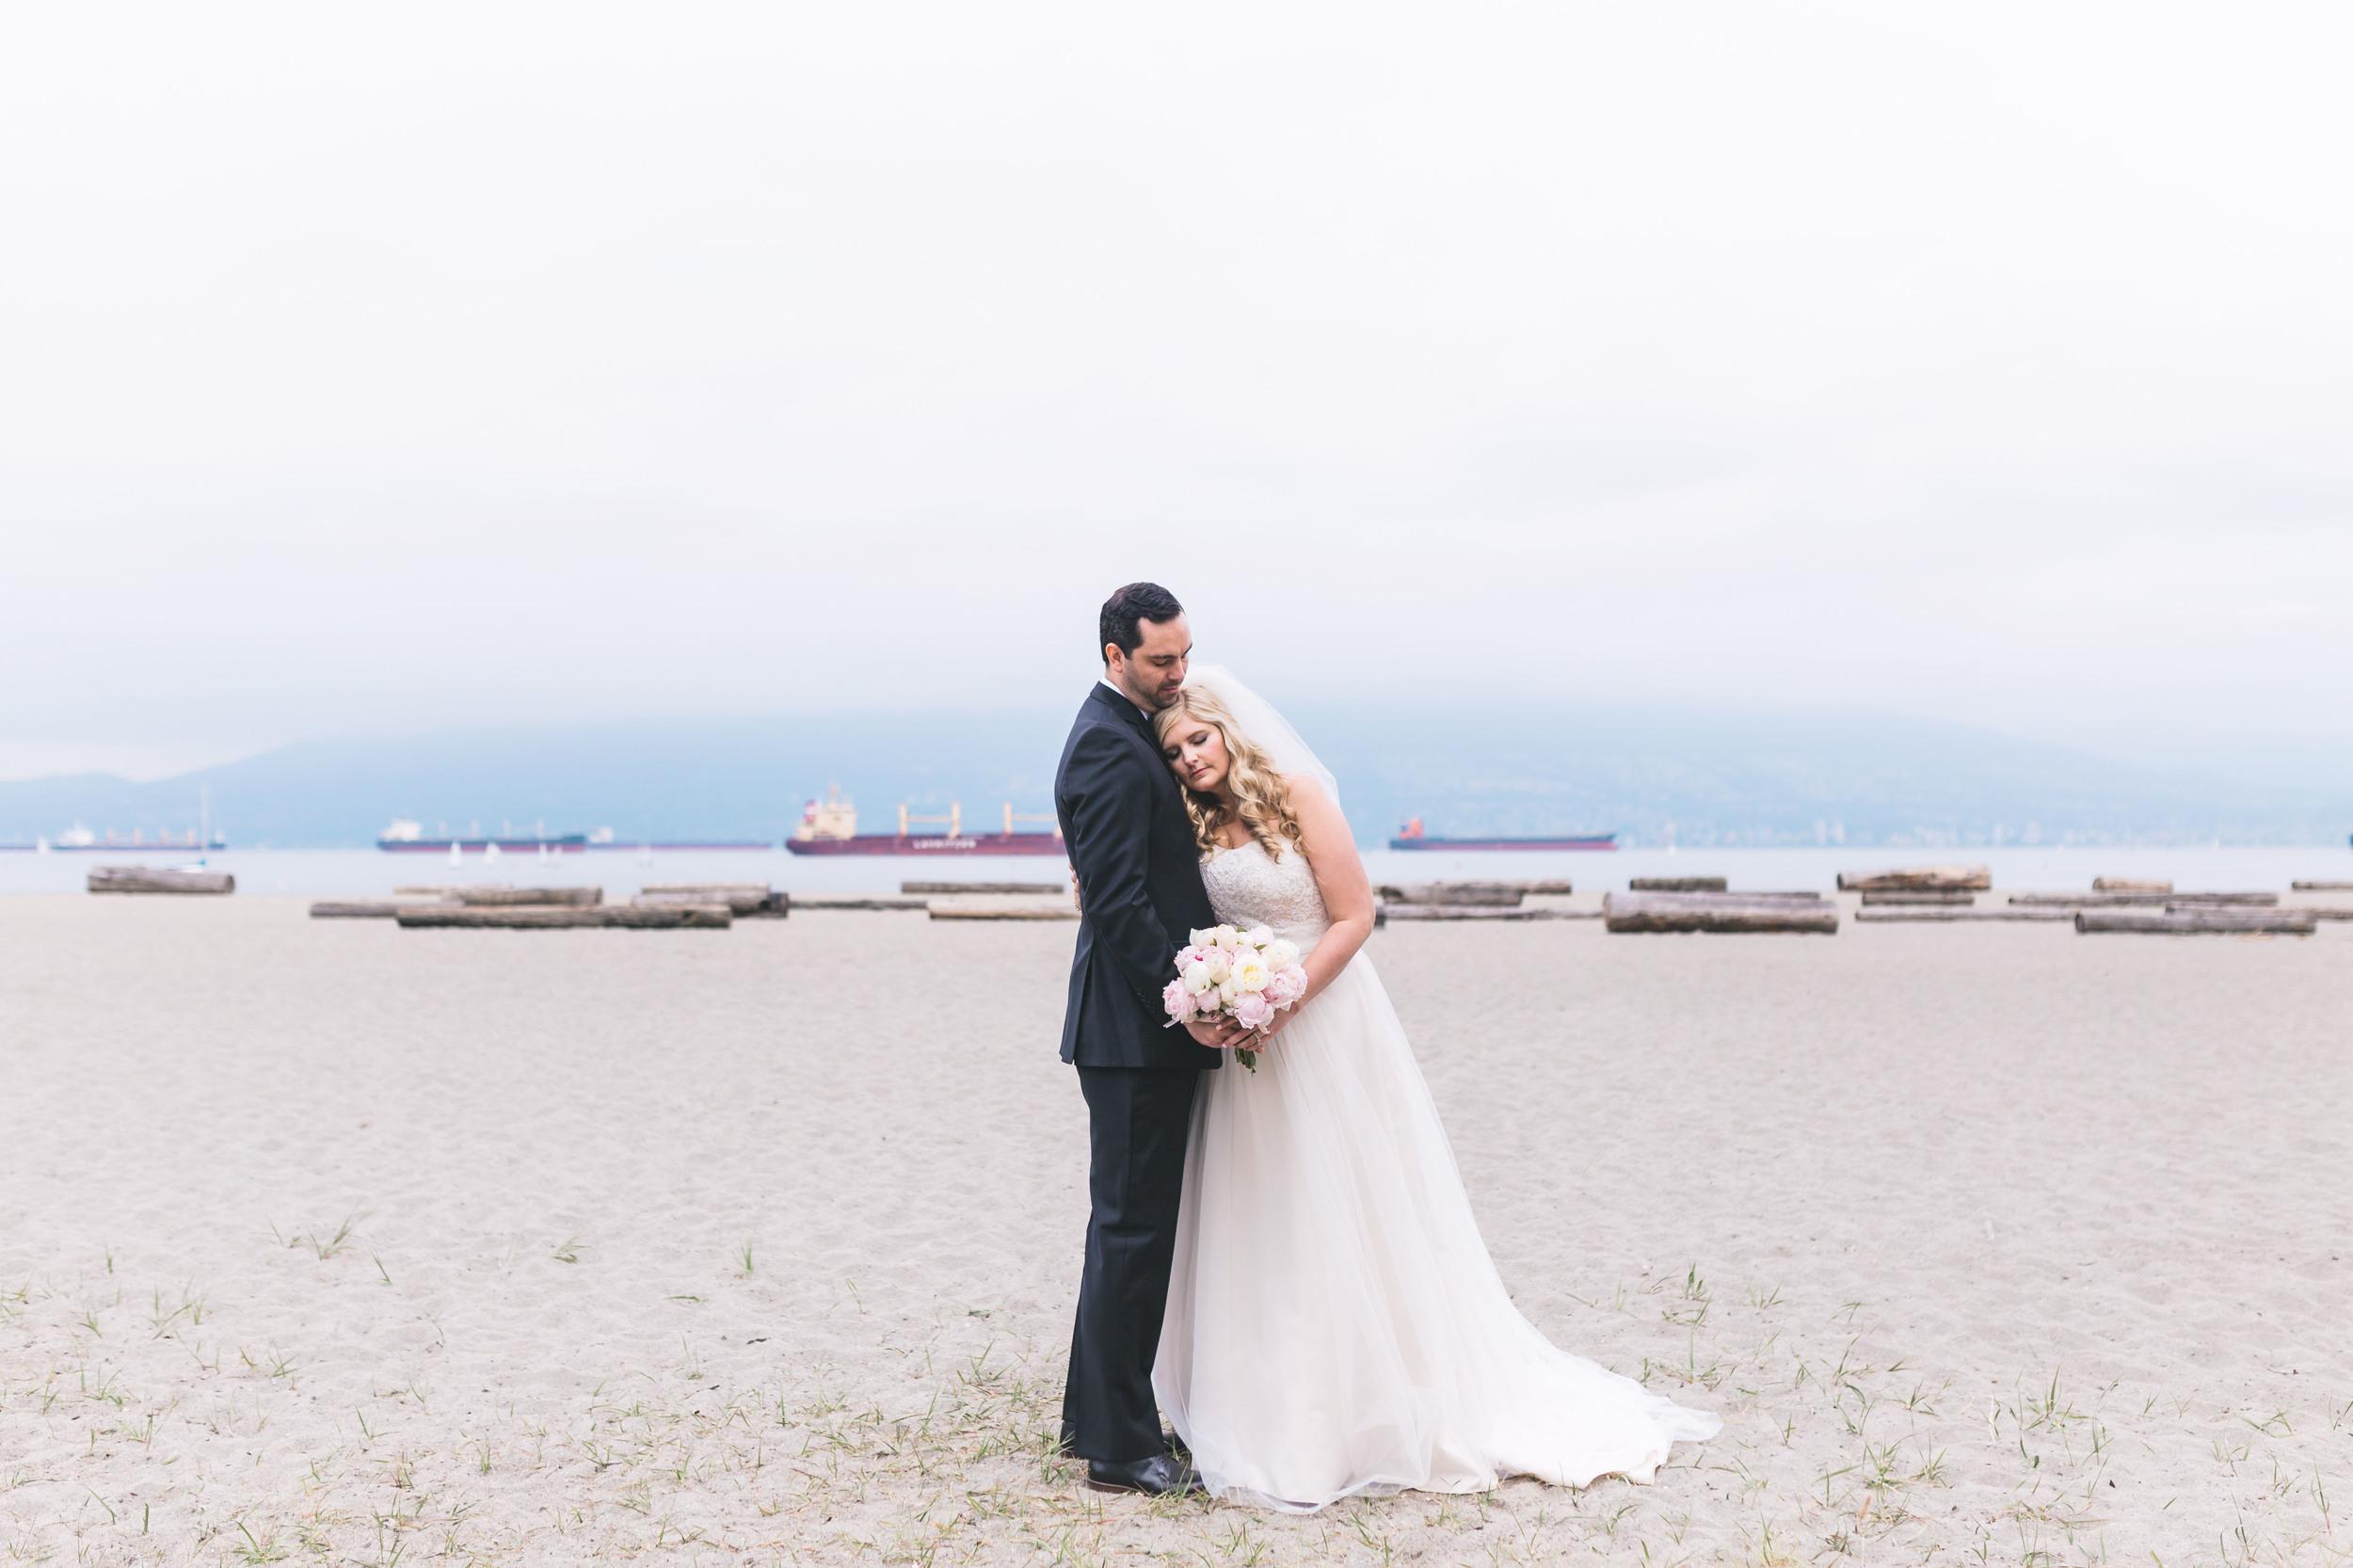 IMG_6381 VANCOUVER WEDDING PHOTOGRAPHER JERICHO BEACH WEDDING JENNIFER PICARD PHOTOGRAPHY.jpg